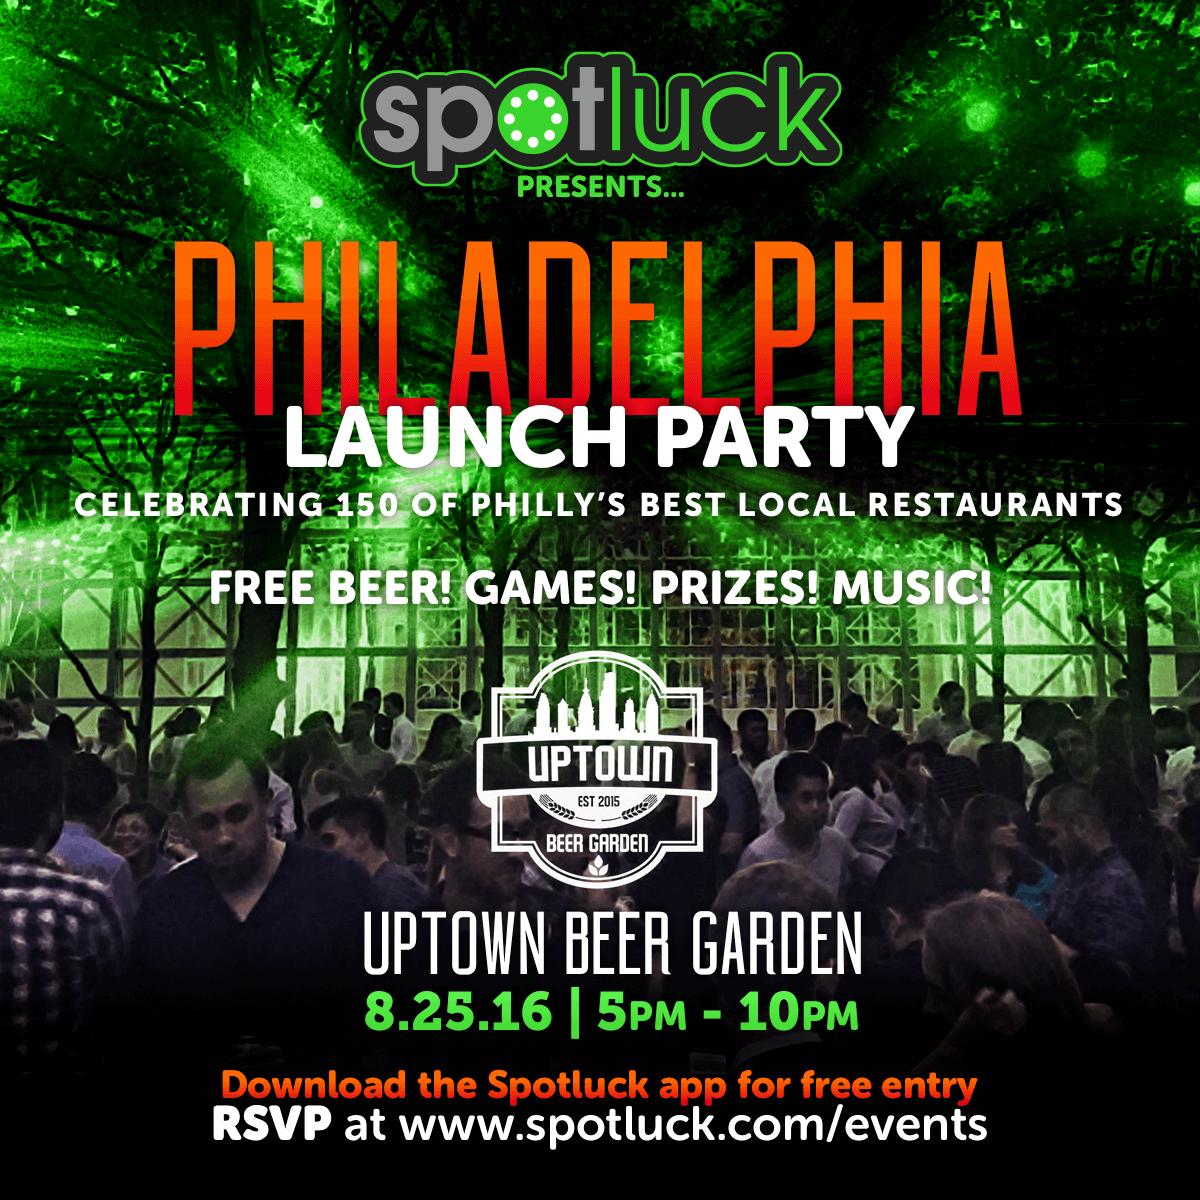 spotluck-philadelphia-city-launch-party